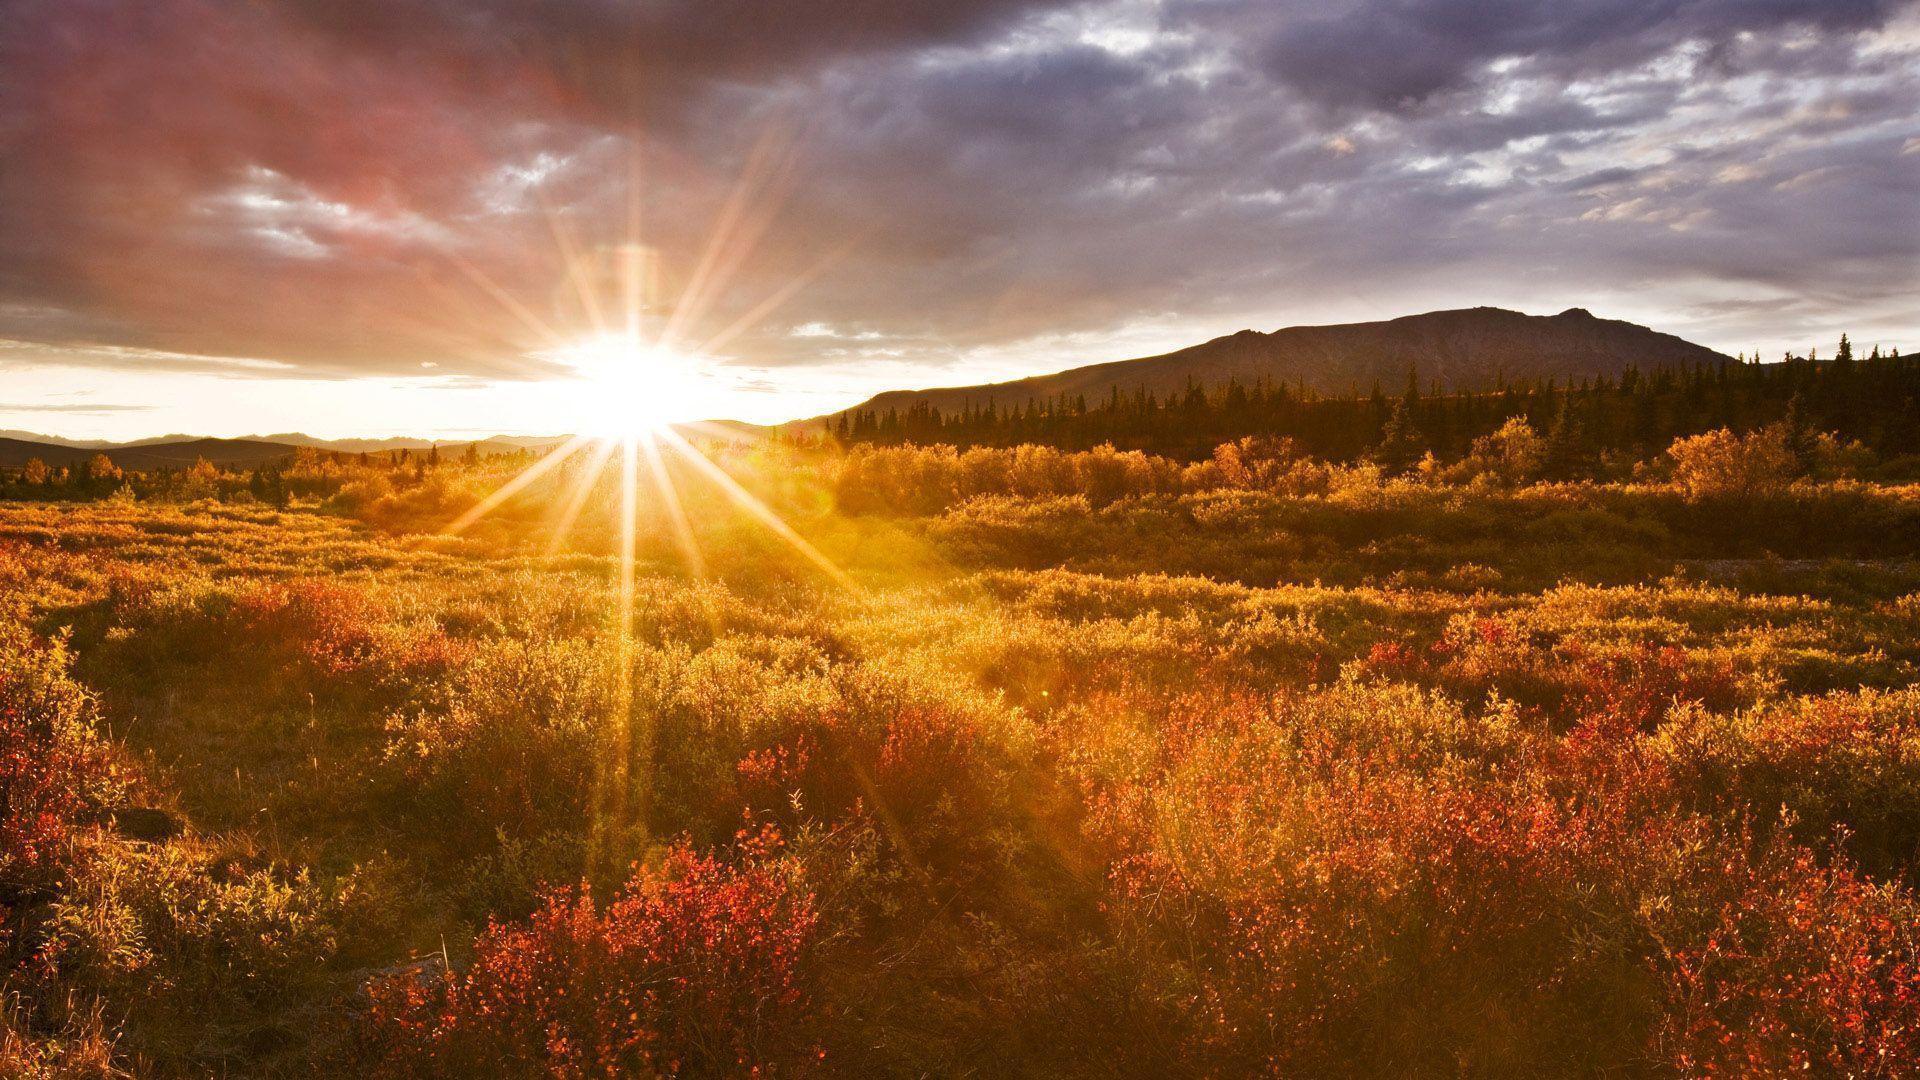 Amazing Sunrise Wallpaper | Wallpaper Download